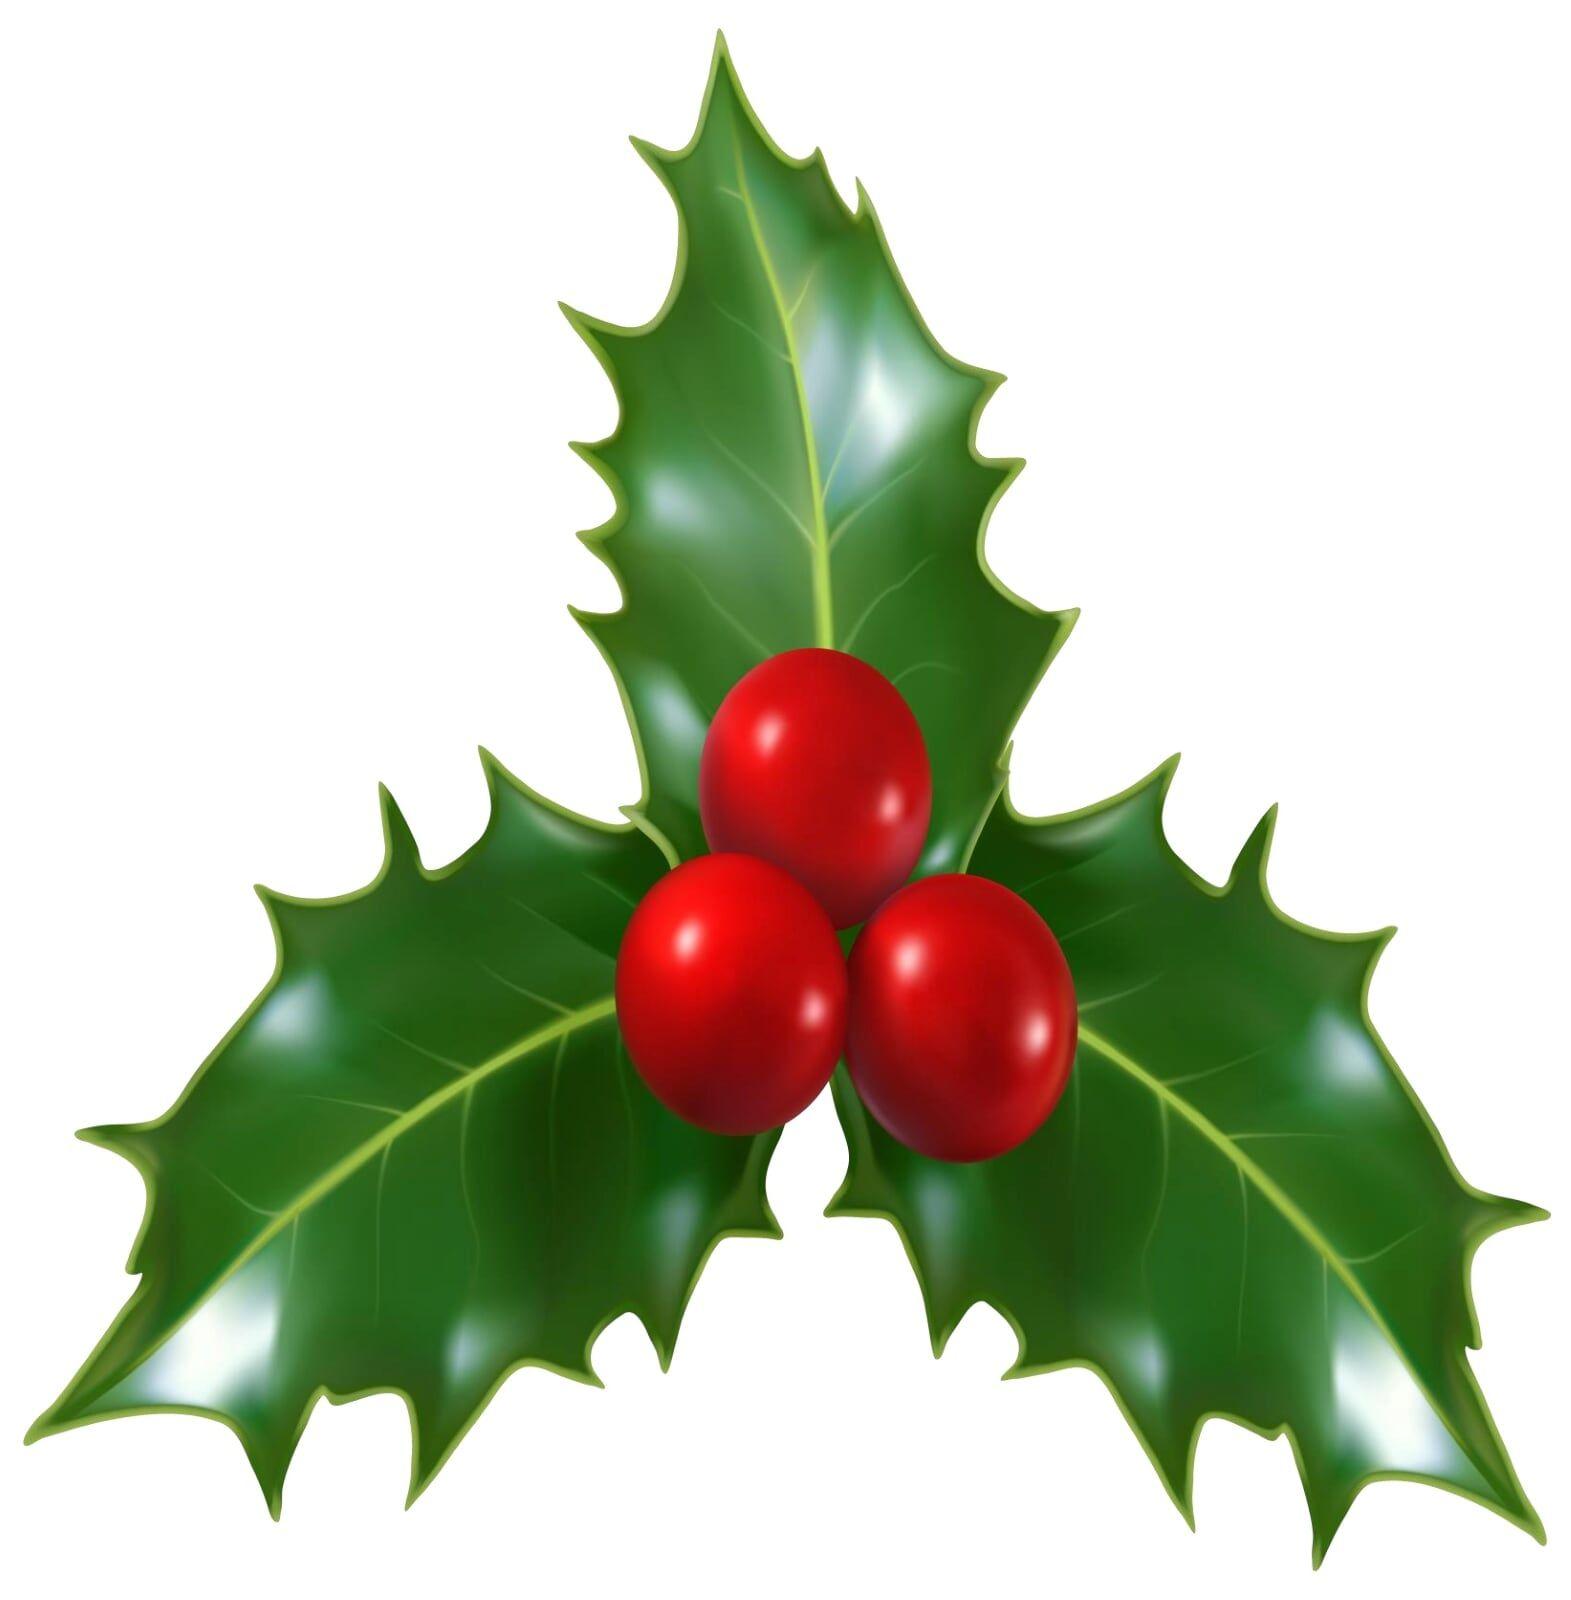 Pin By Sonia Tourkolia On Clip Art Christmas Holly Christmas